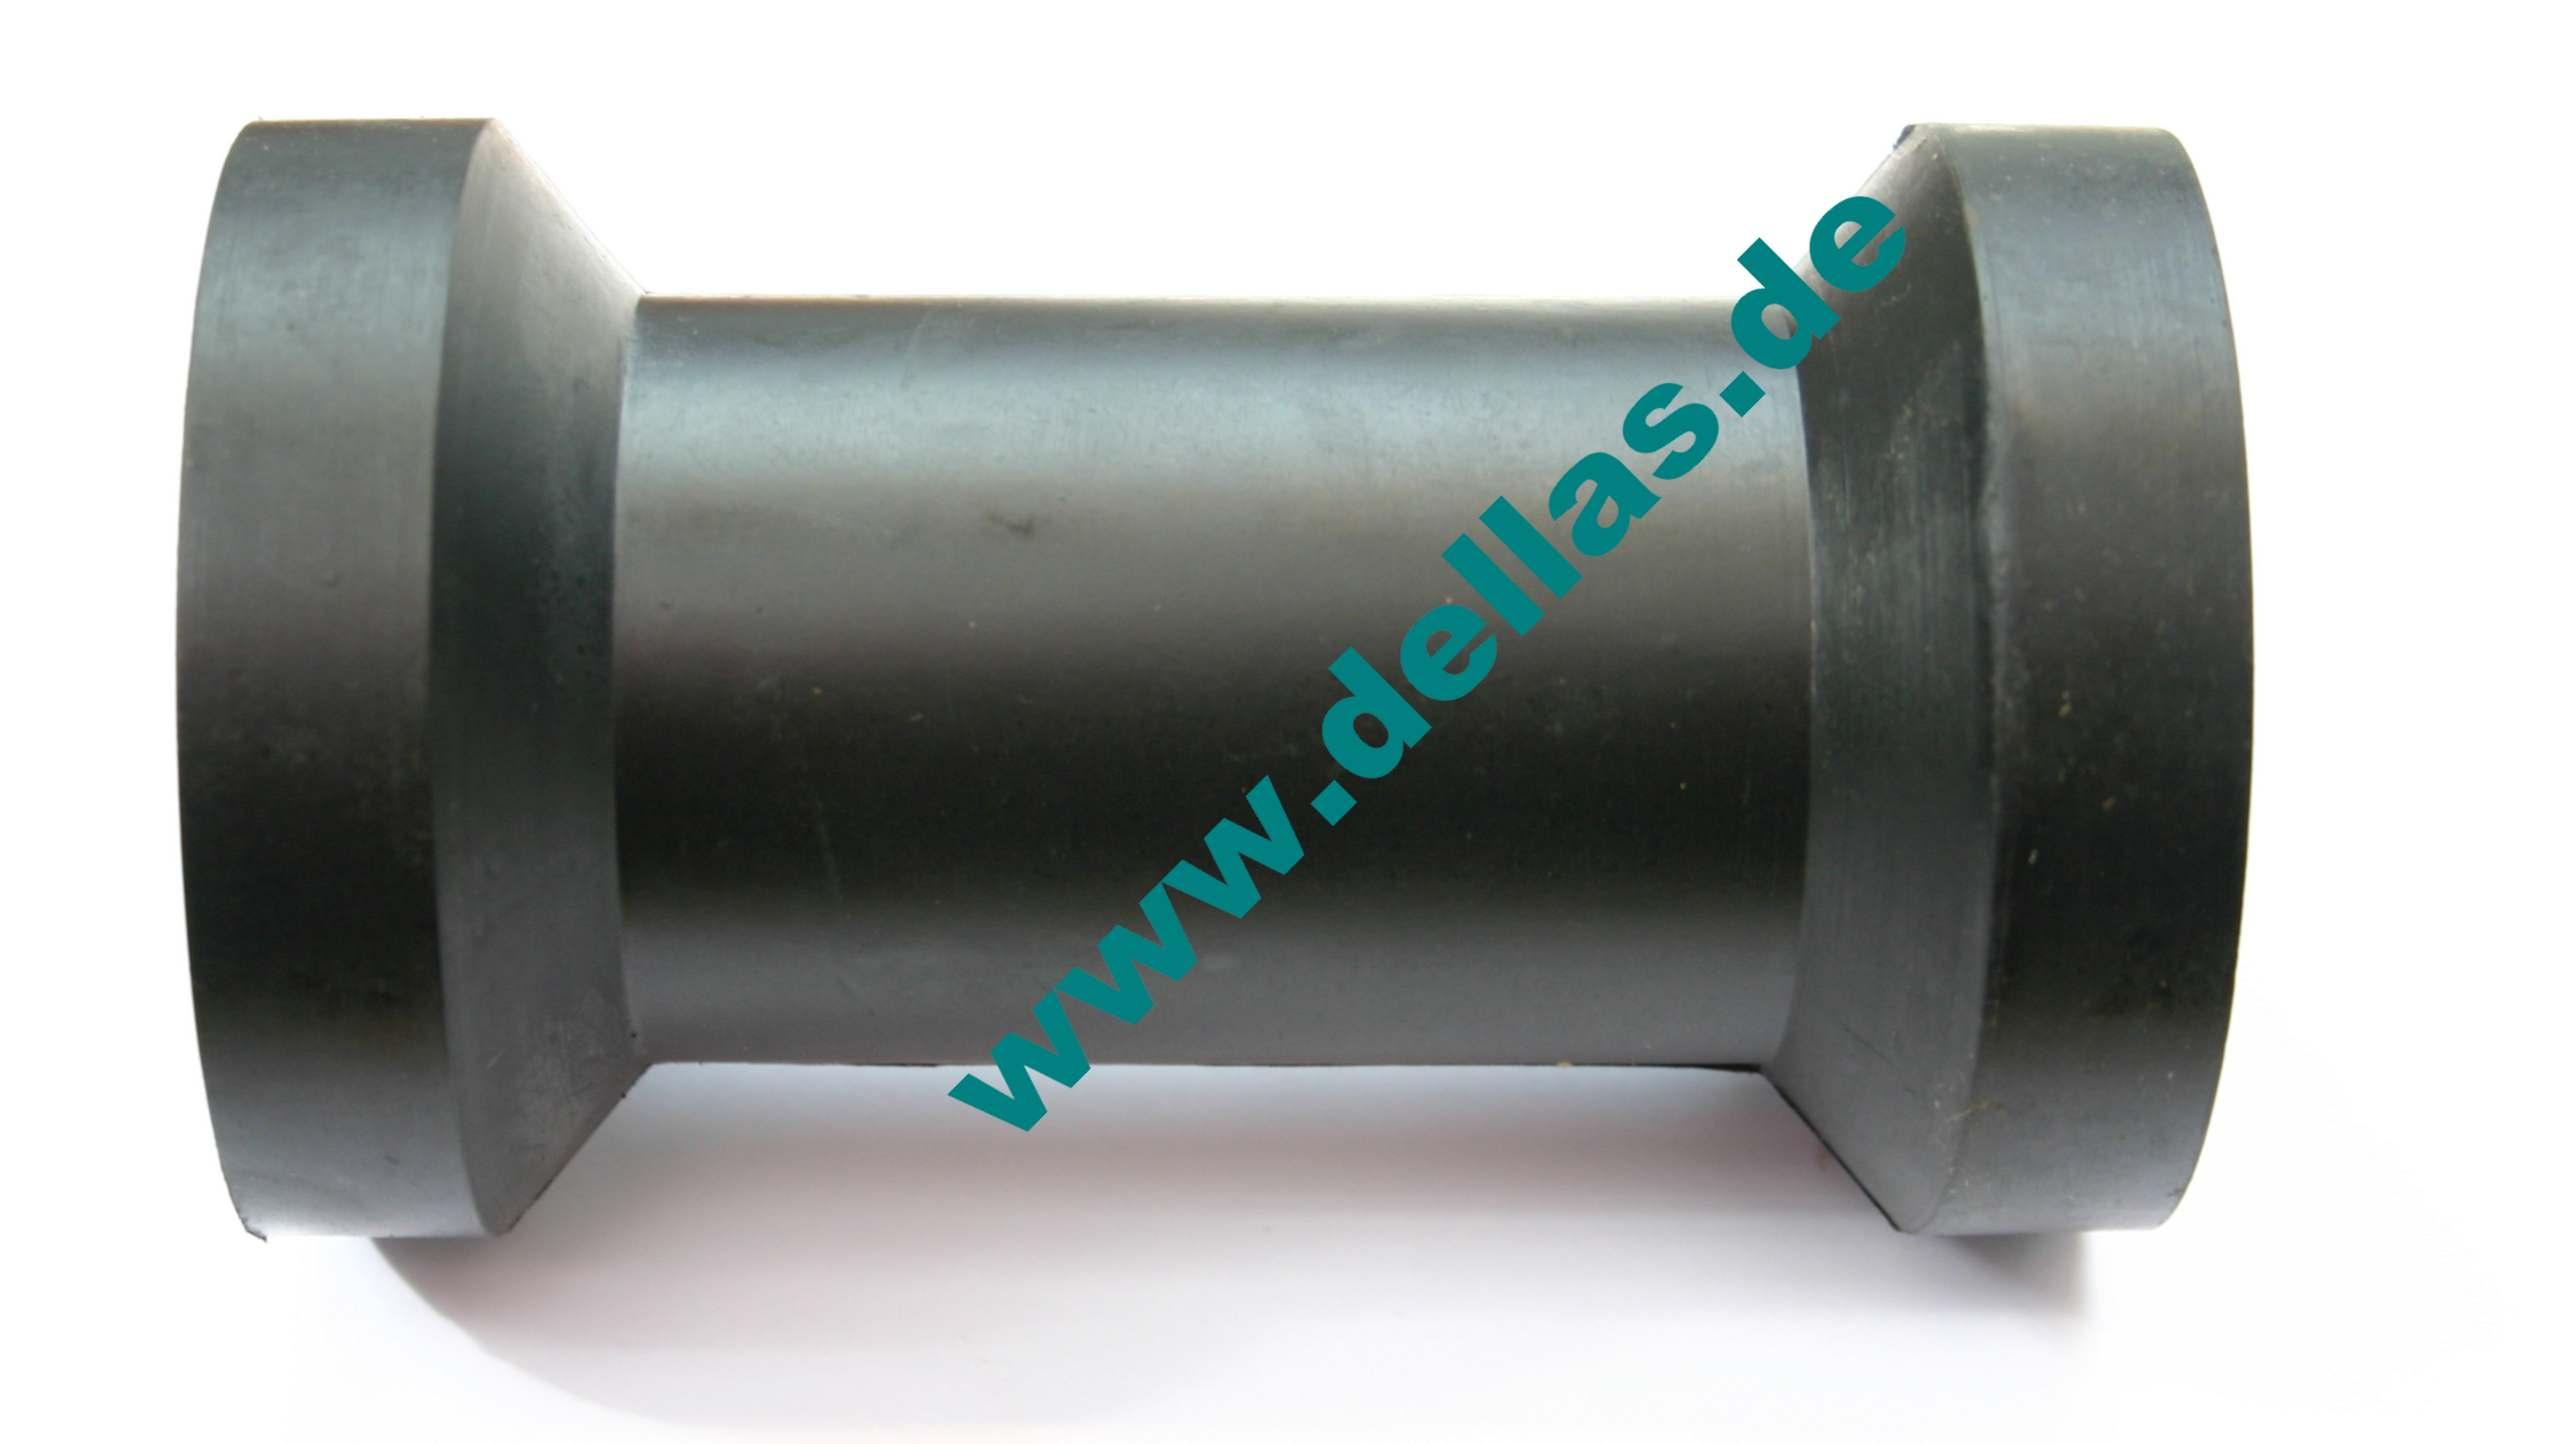 Kielrolle 130 mm Gummi schwarz